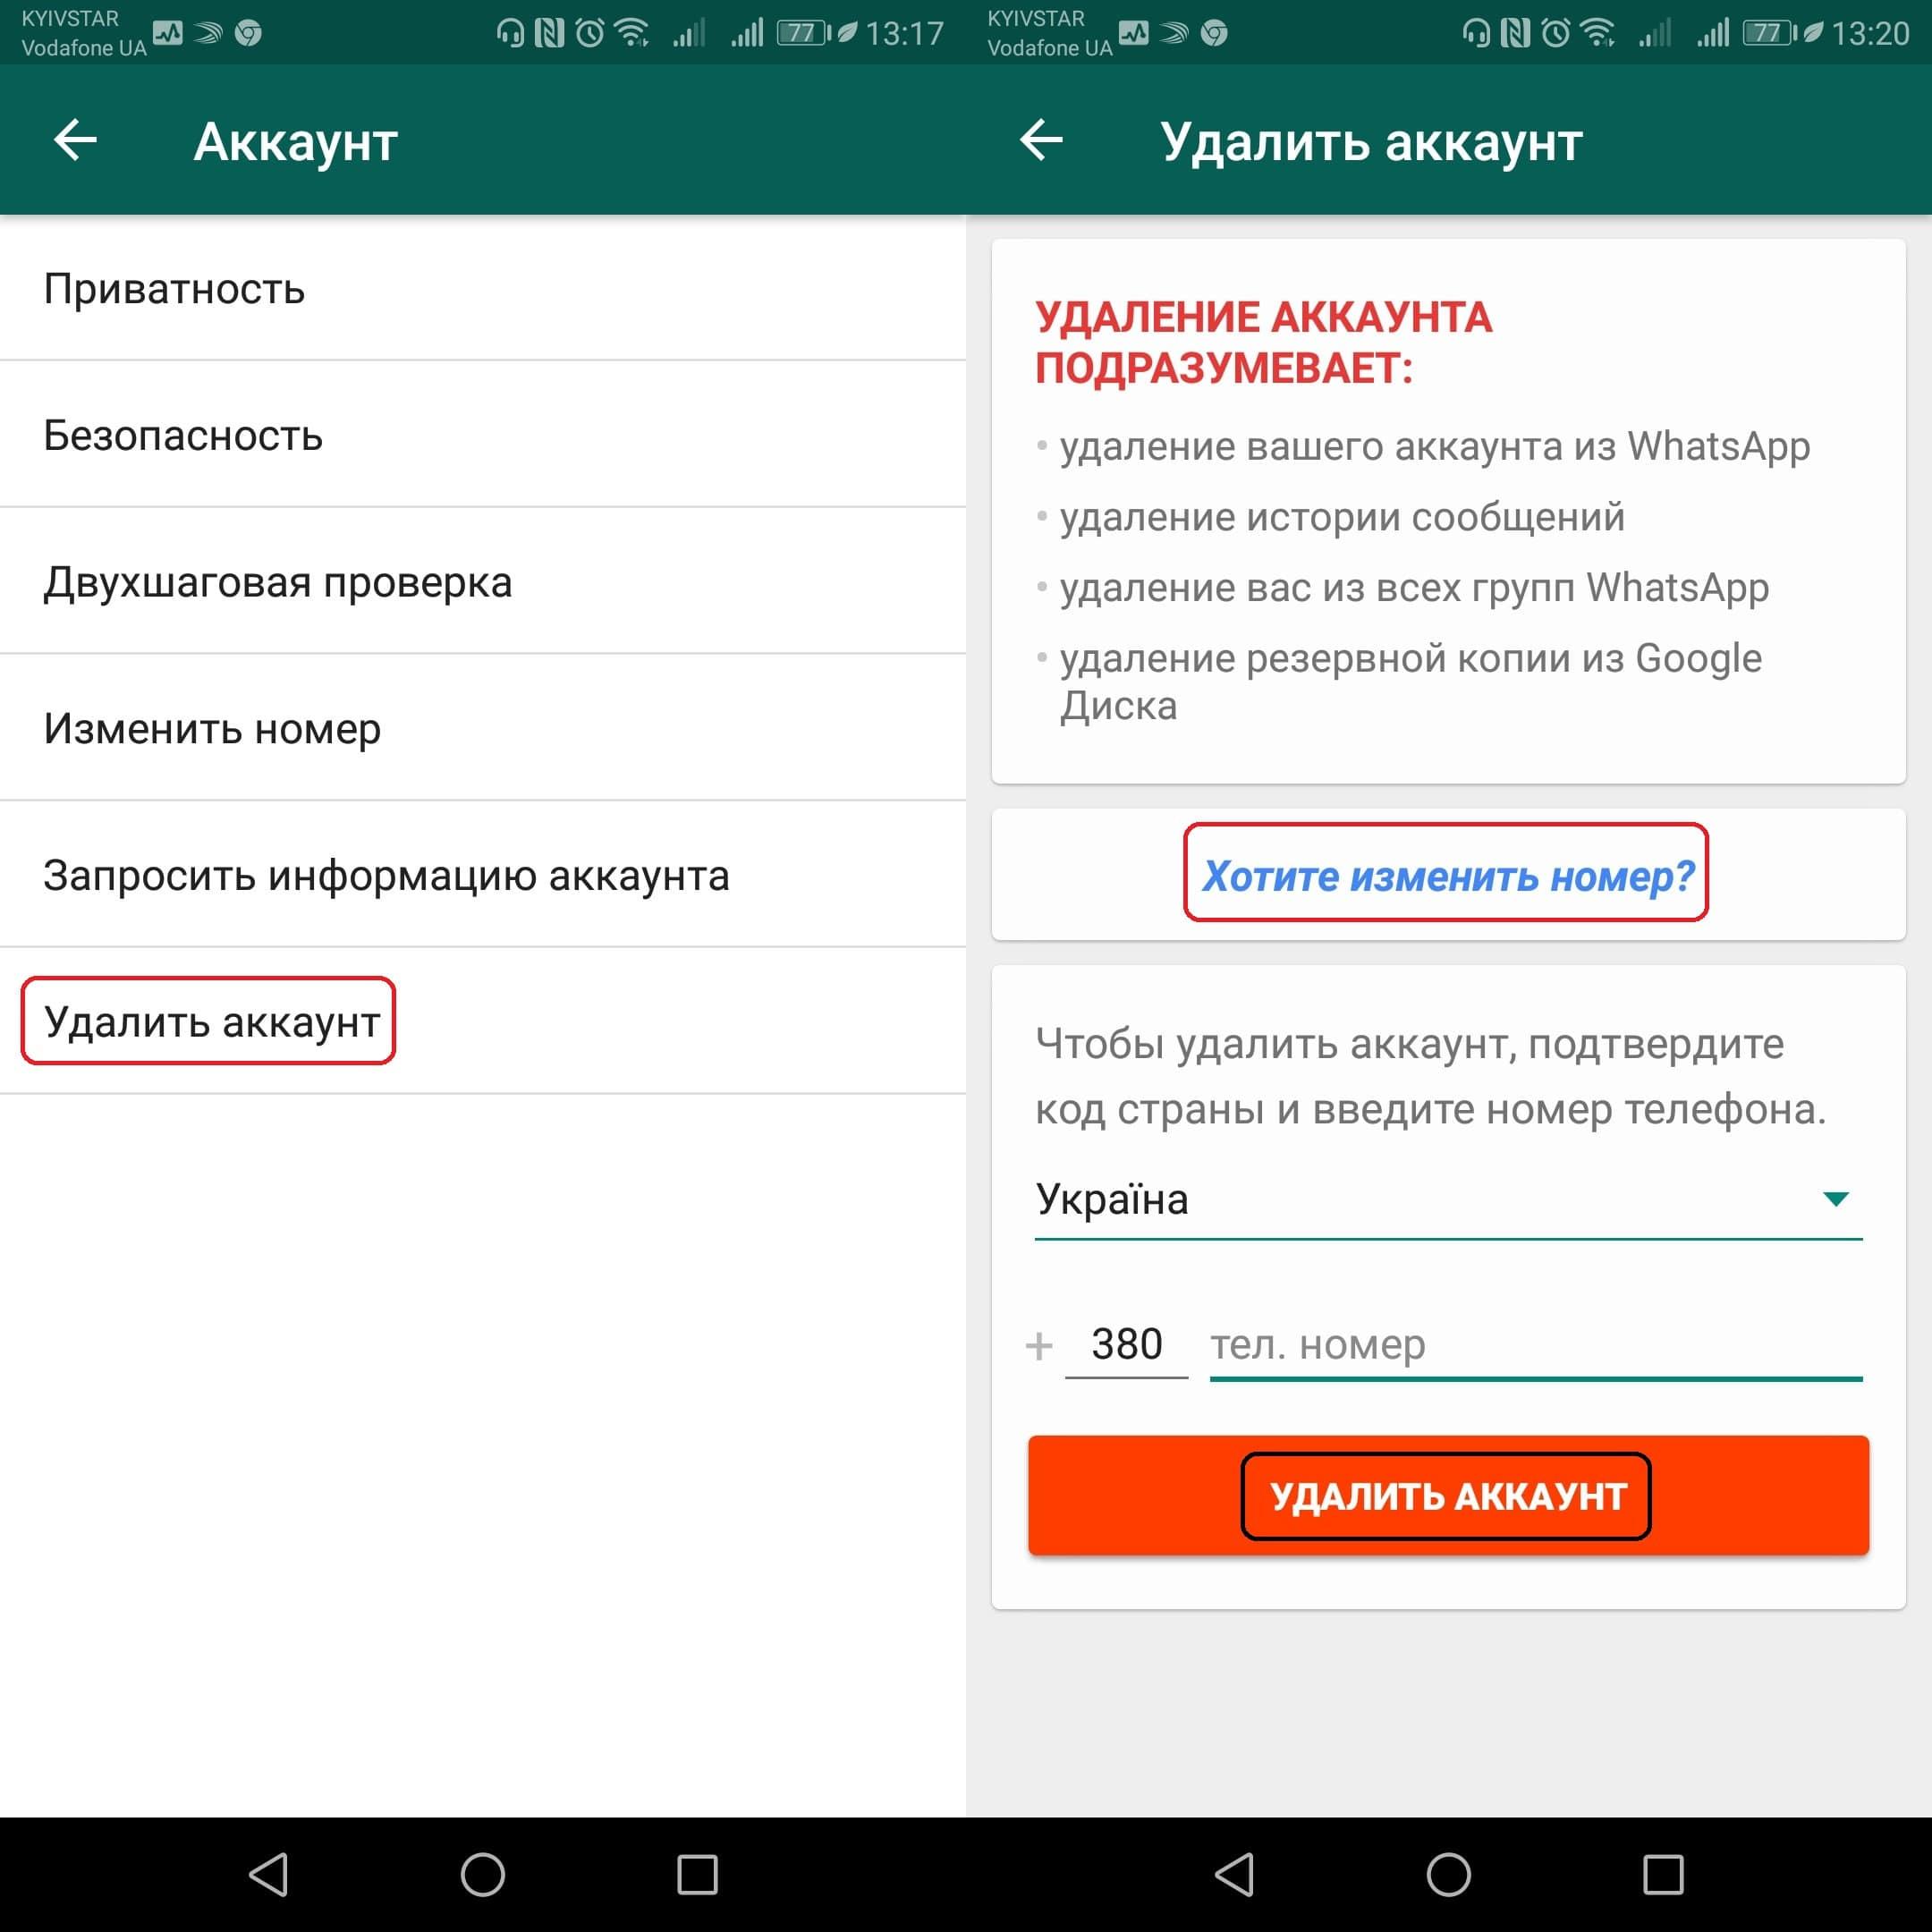 Картинка 2 Как удалить WhatsApp-аккаунт раз и навсегда